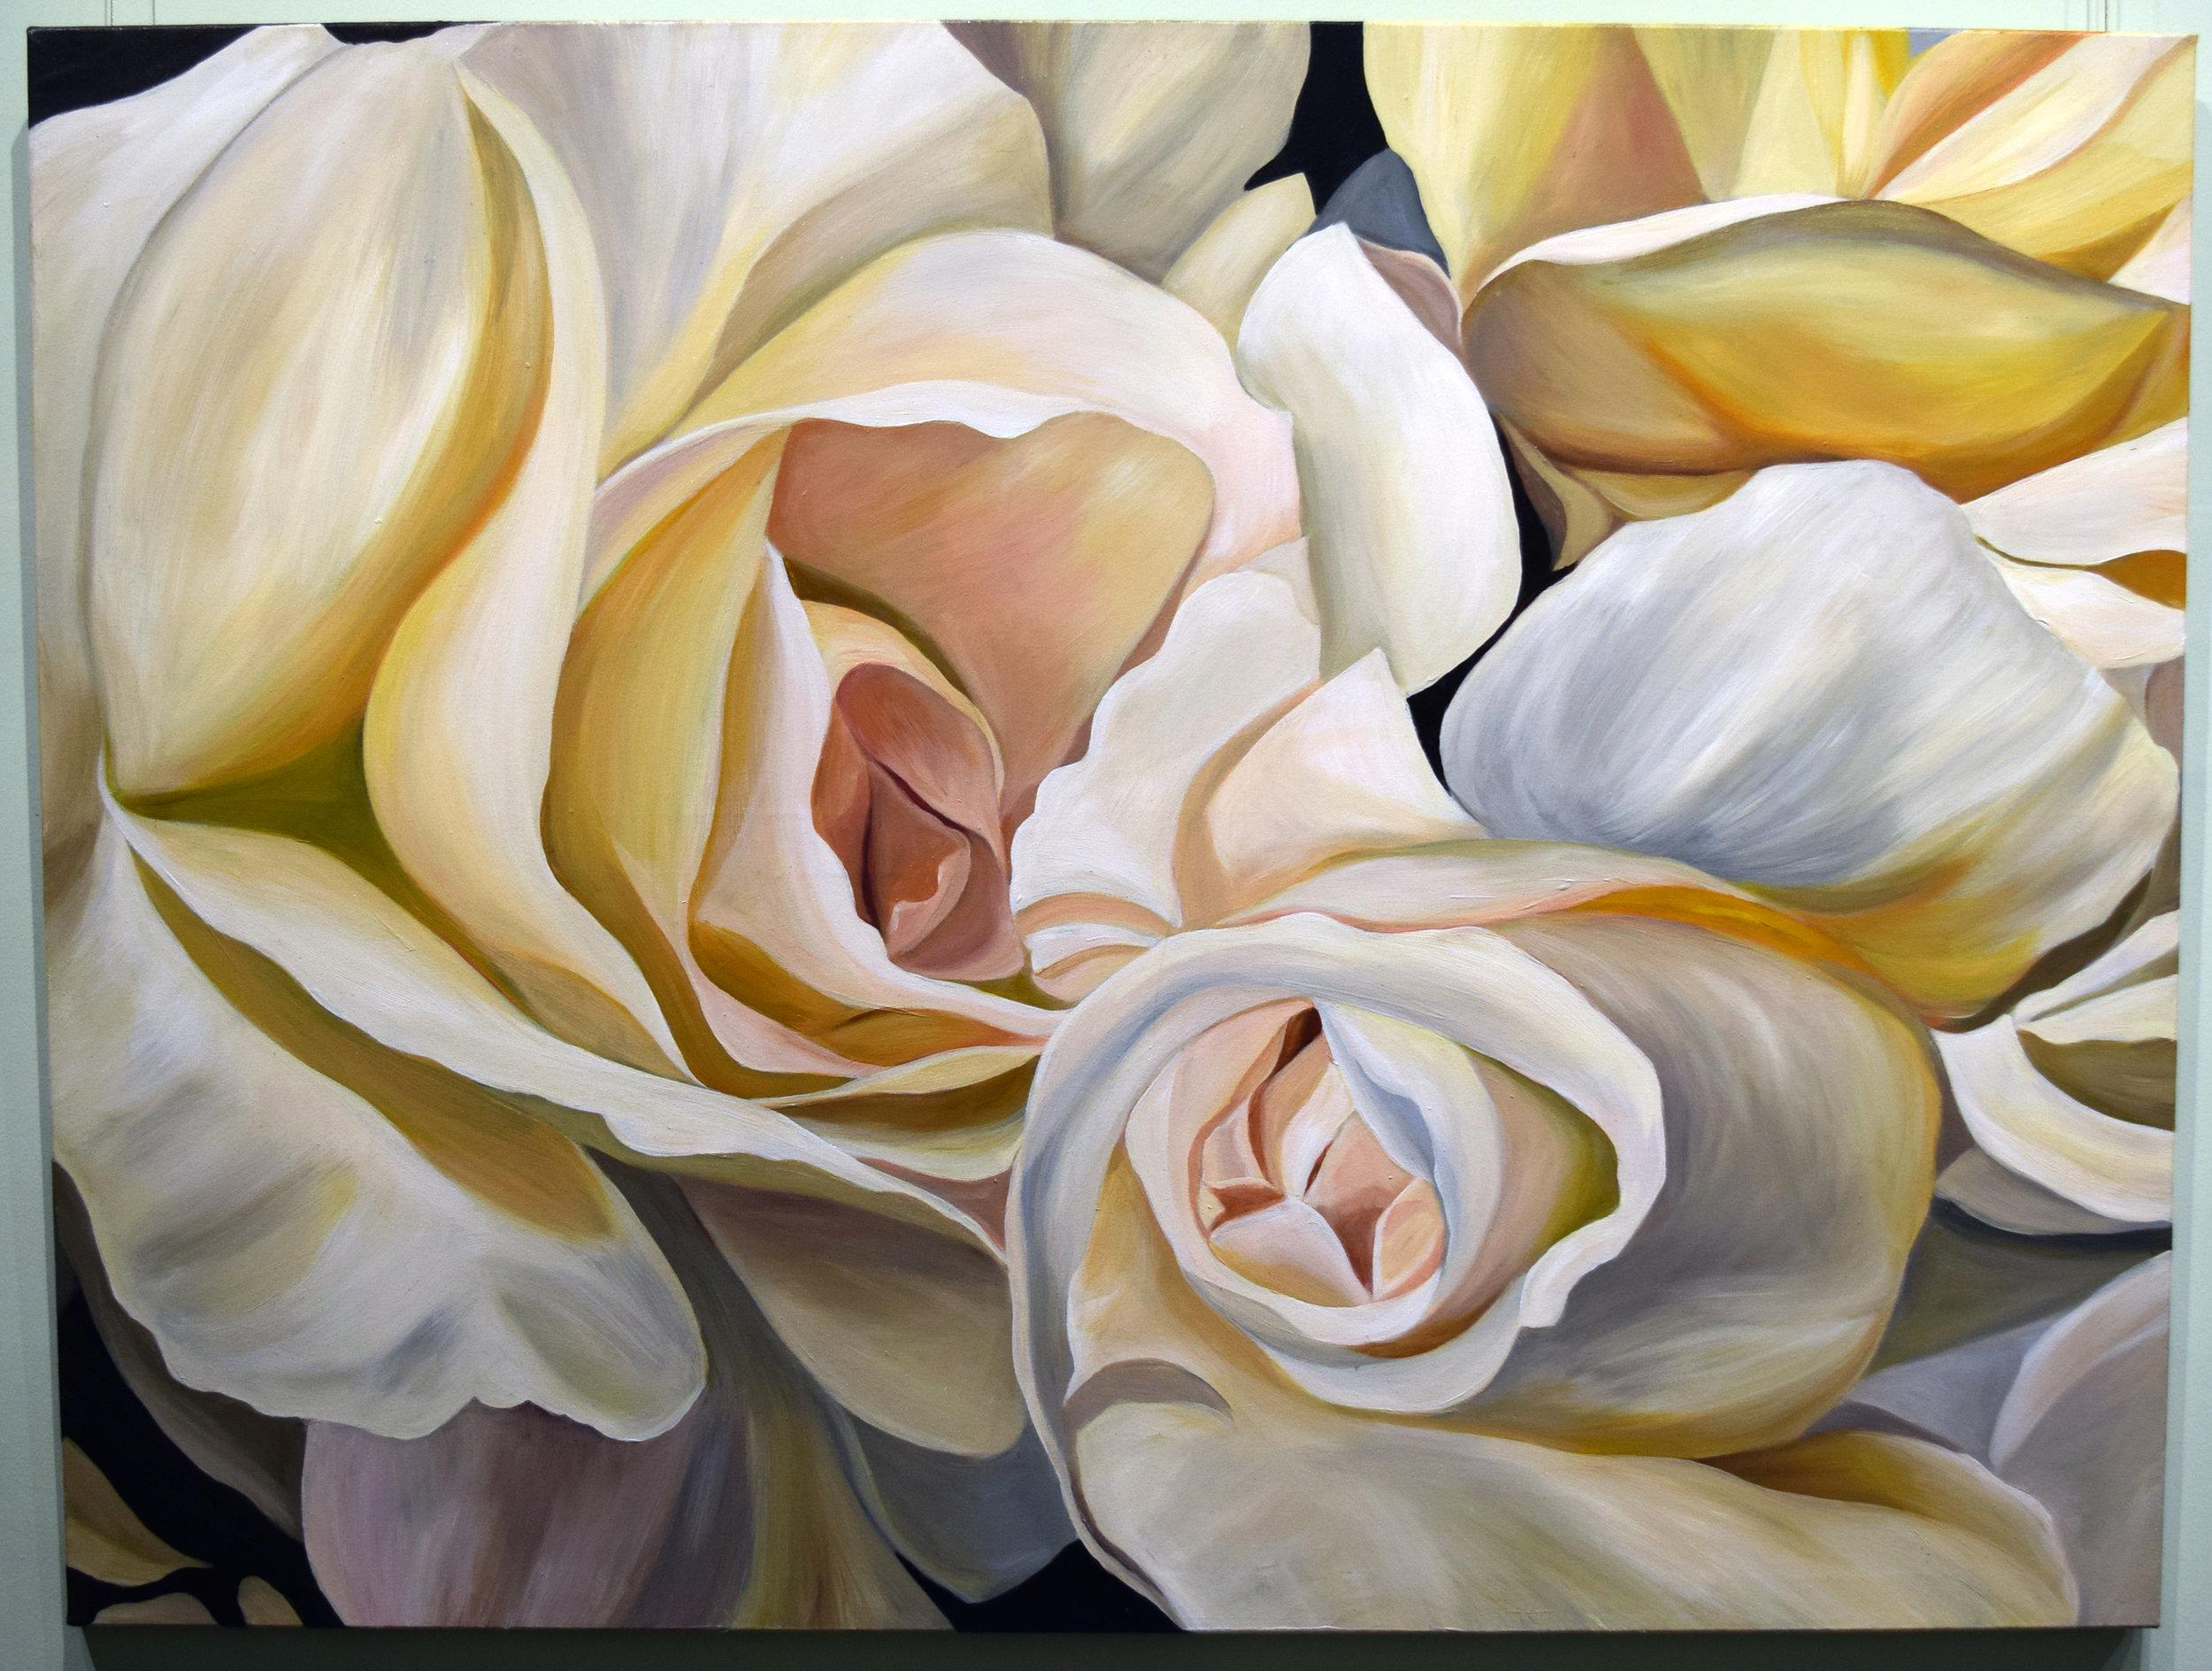 24. Jacqueline Coates, Tints and Shades, 2011, acrylic on canvas, 90 x 120 cm, $3,850